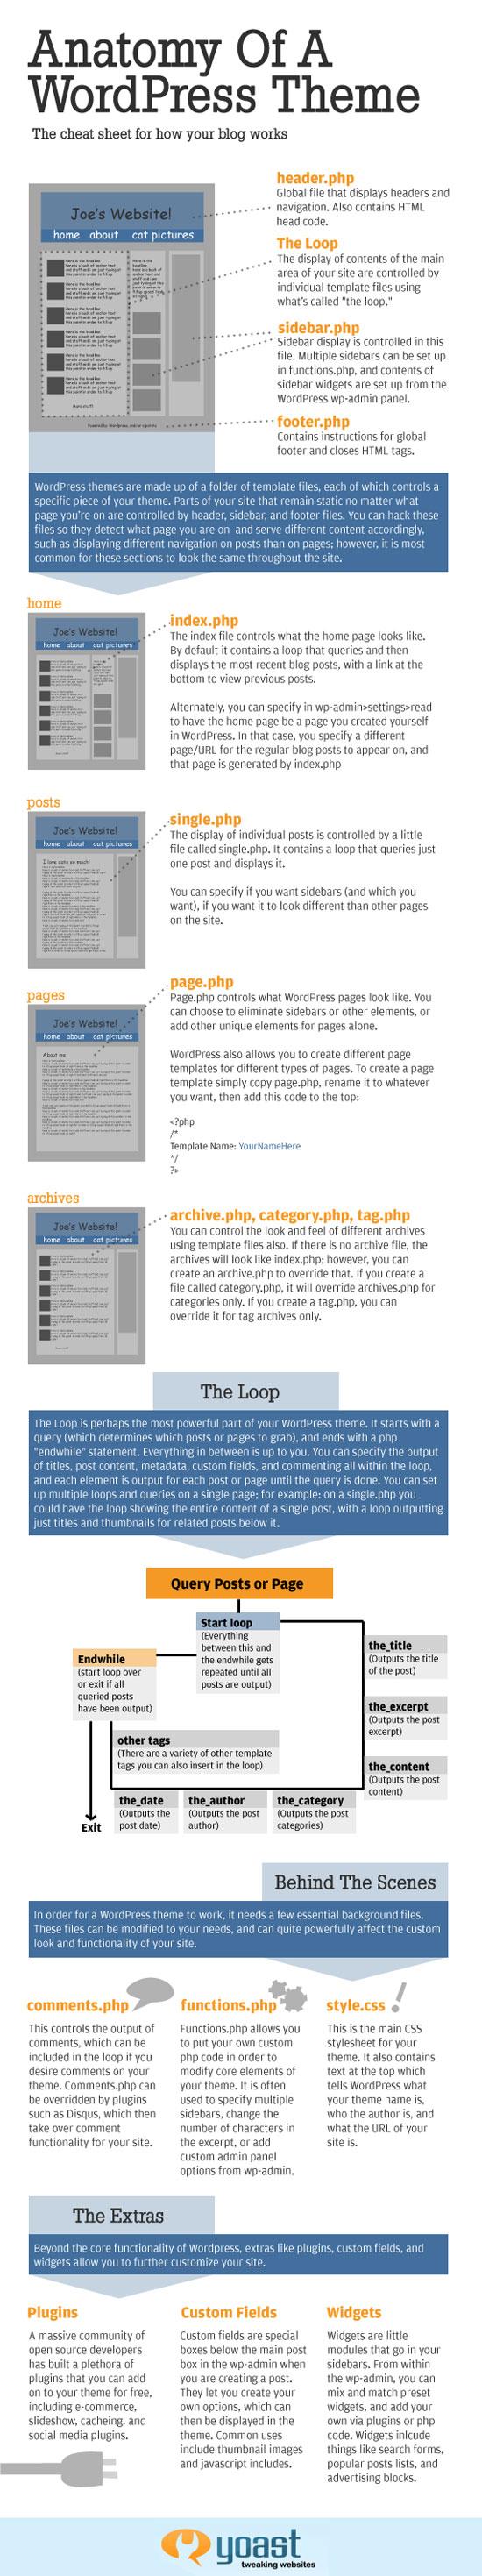 anatomy-of-a-WordPress theme